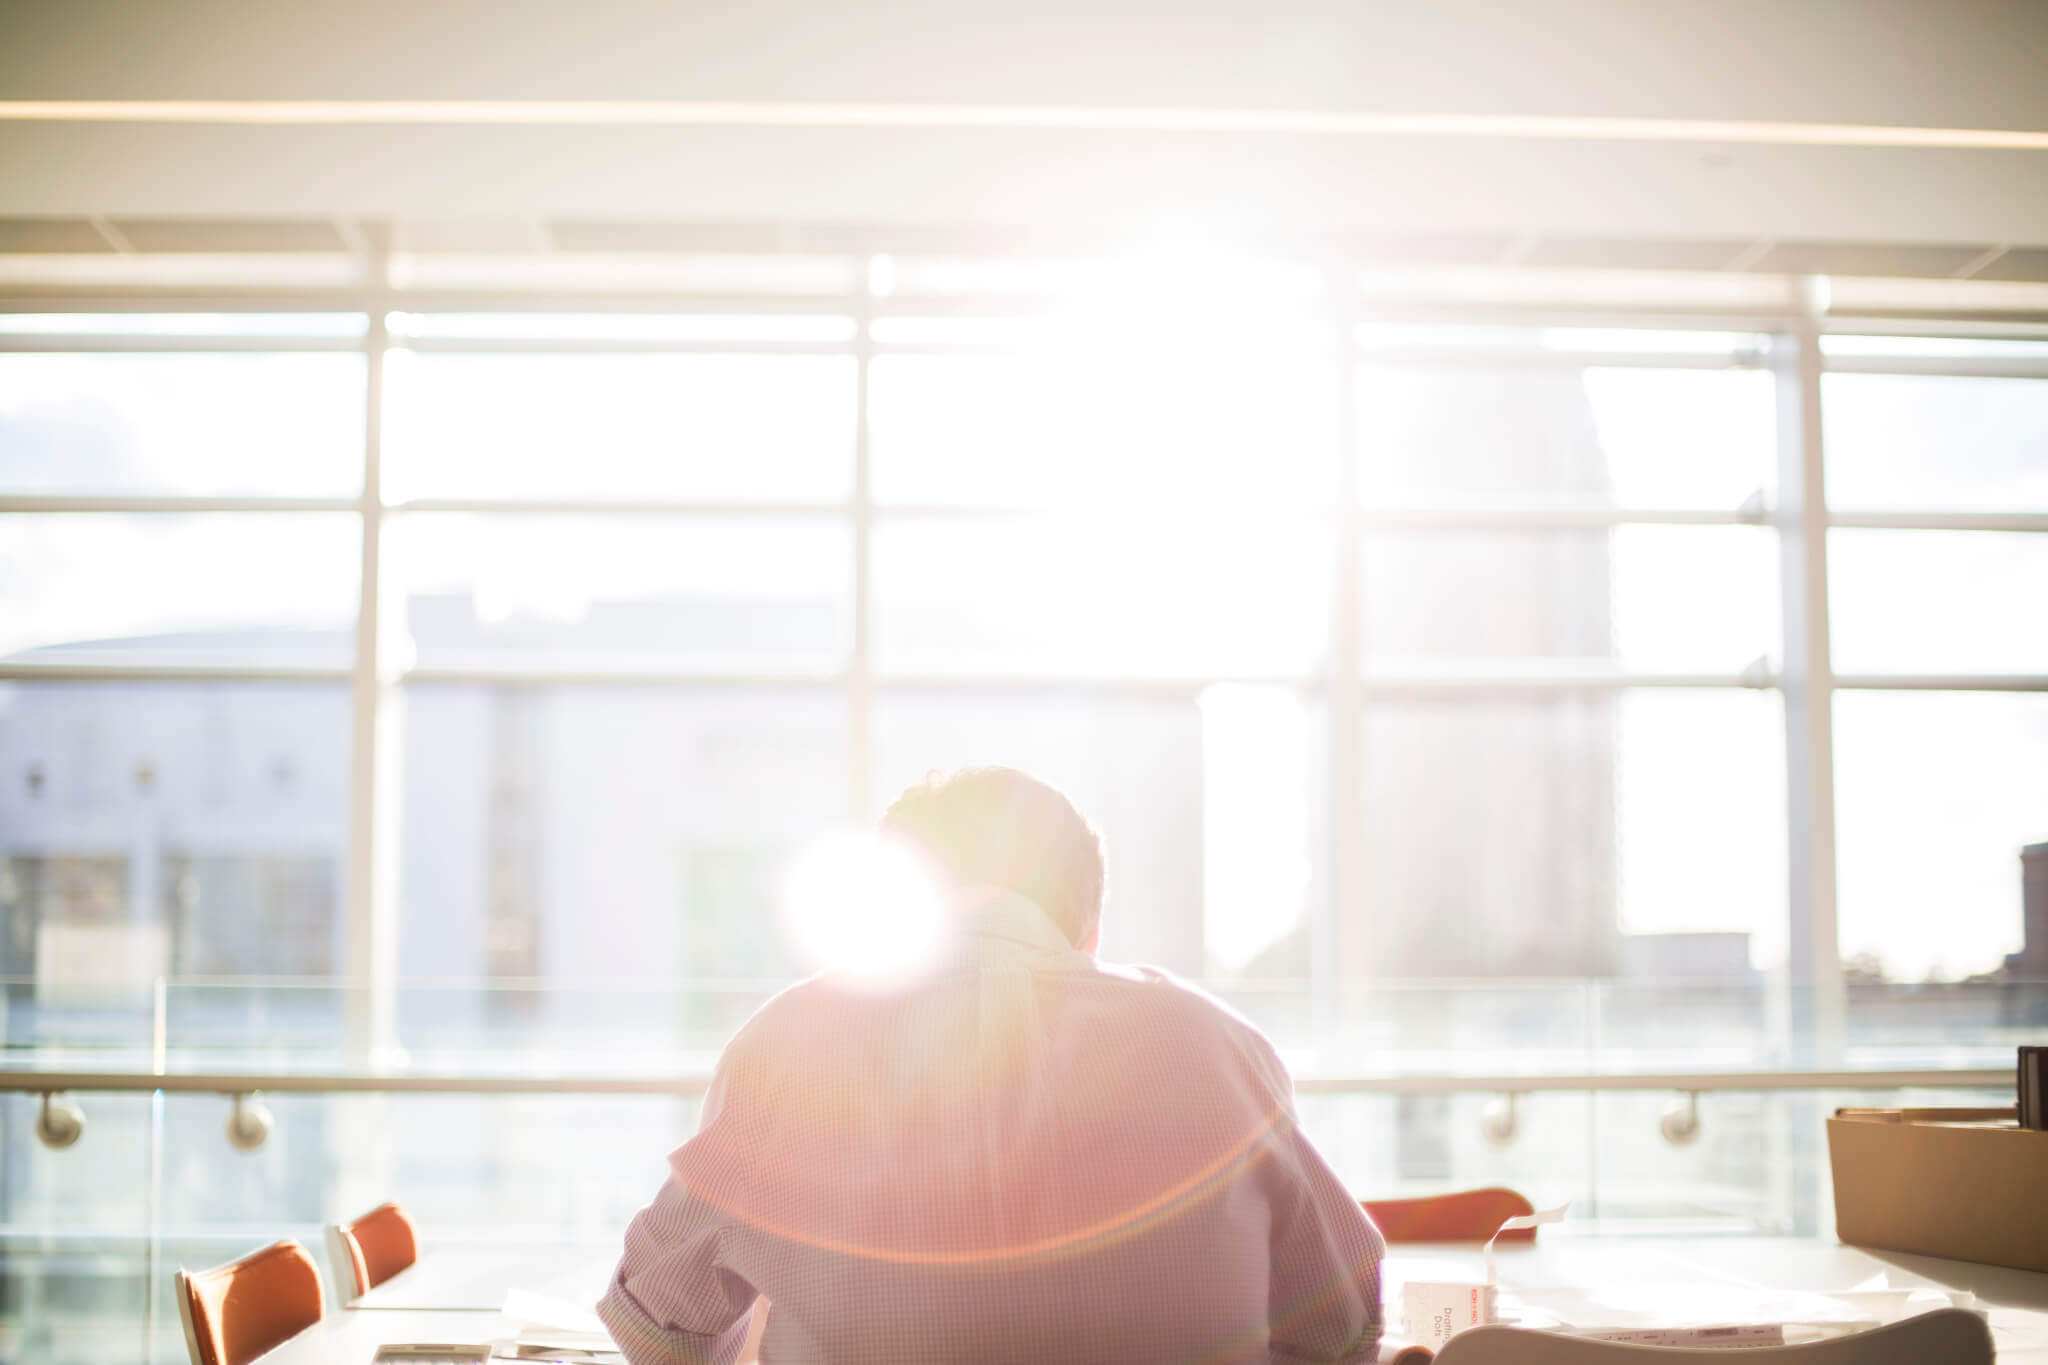 Hitze im Büro (c) Bethany Legg / unsplash.com